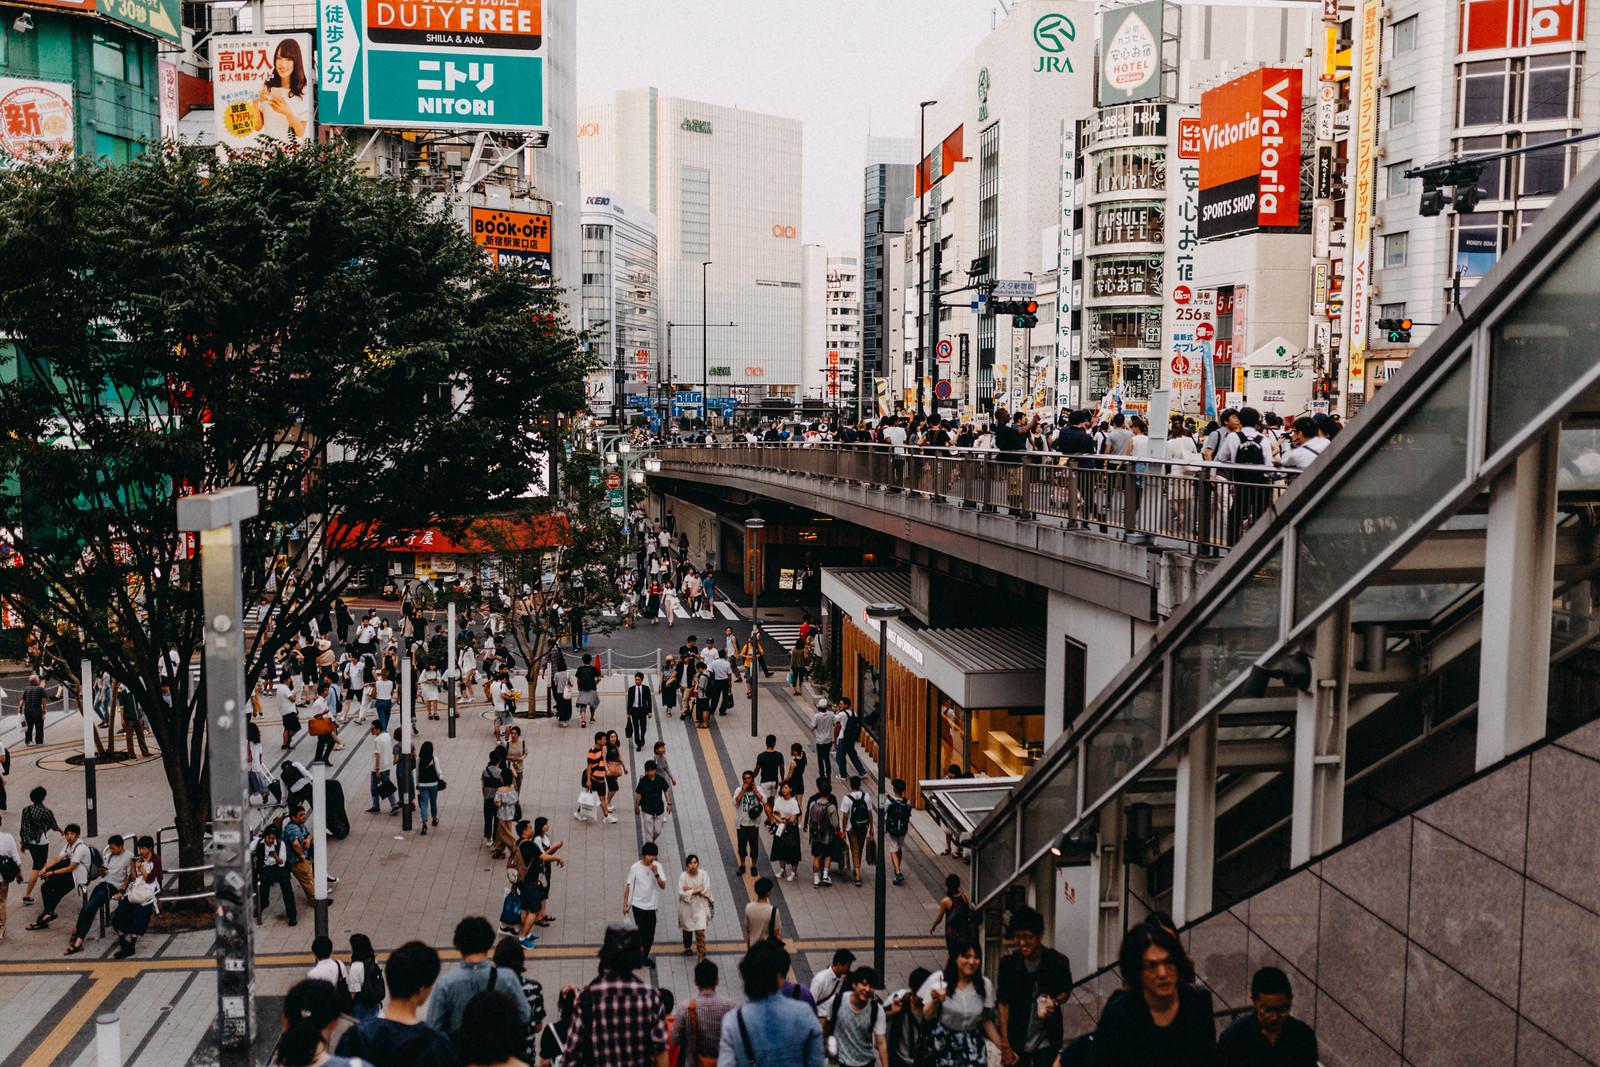 Crowded streets near Shinjuku Ku Central Station in Tokyo Japan